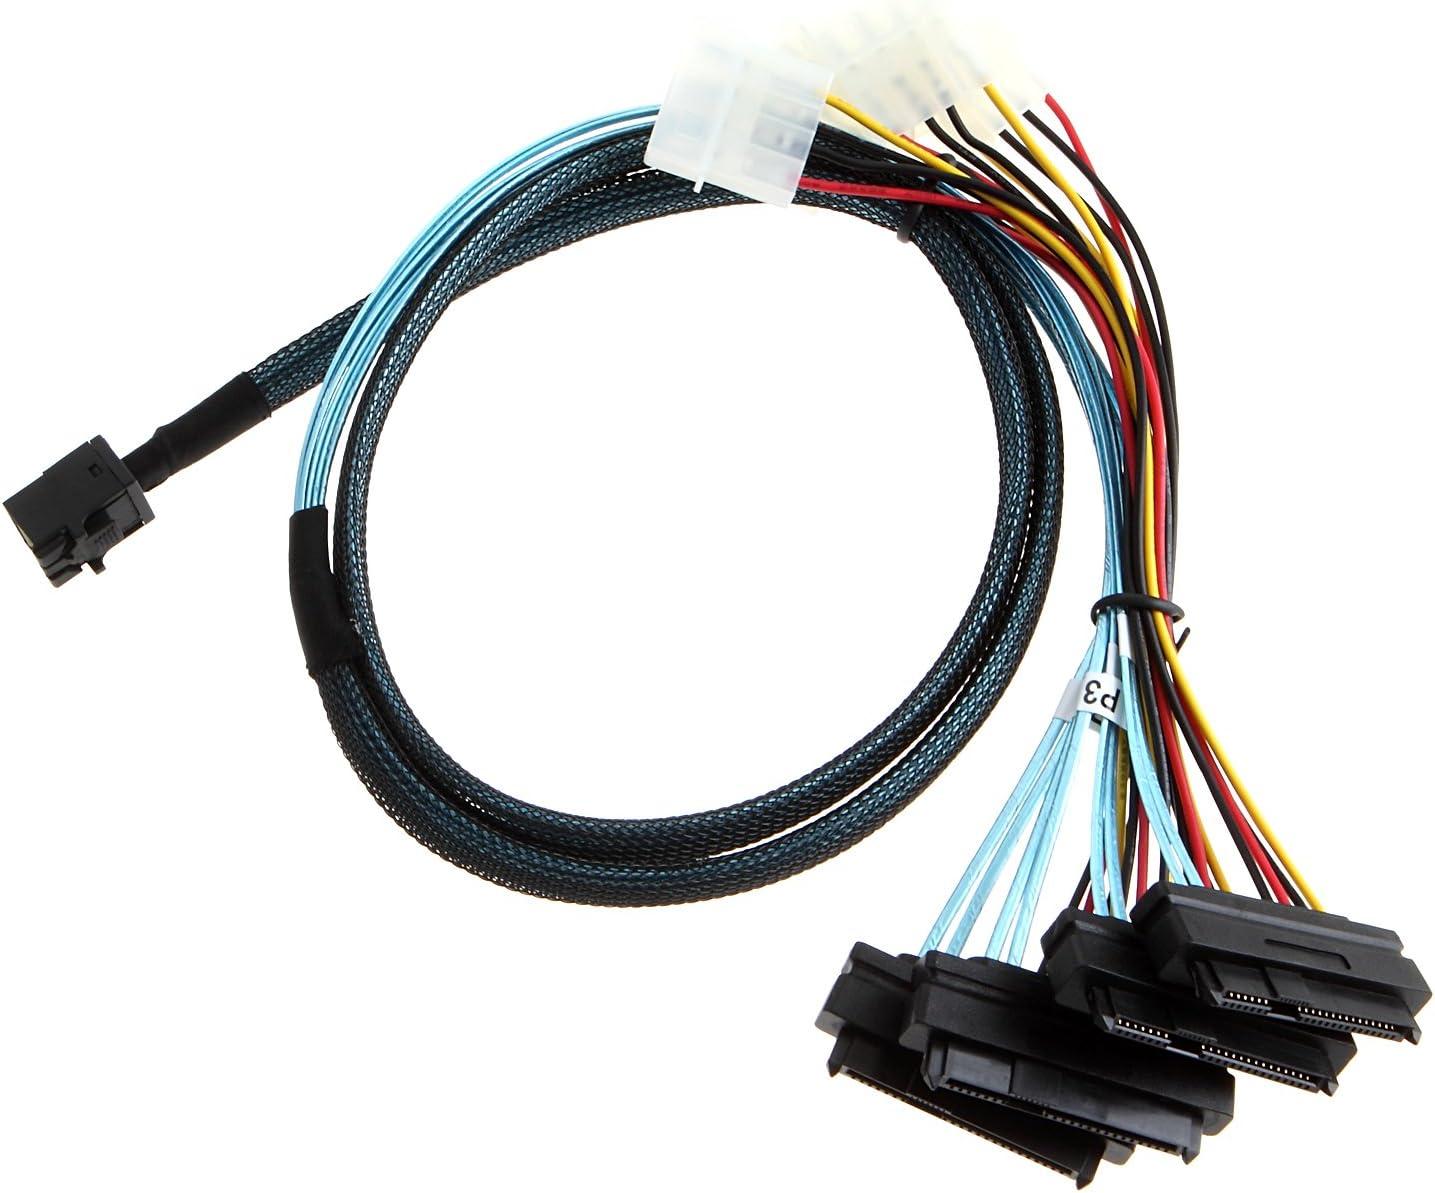 SFF-8482 Connectors With SATA Power Cable 100cm WI1 Mini SAS 36P SFF-8087 to 4